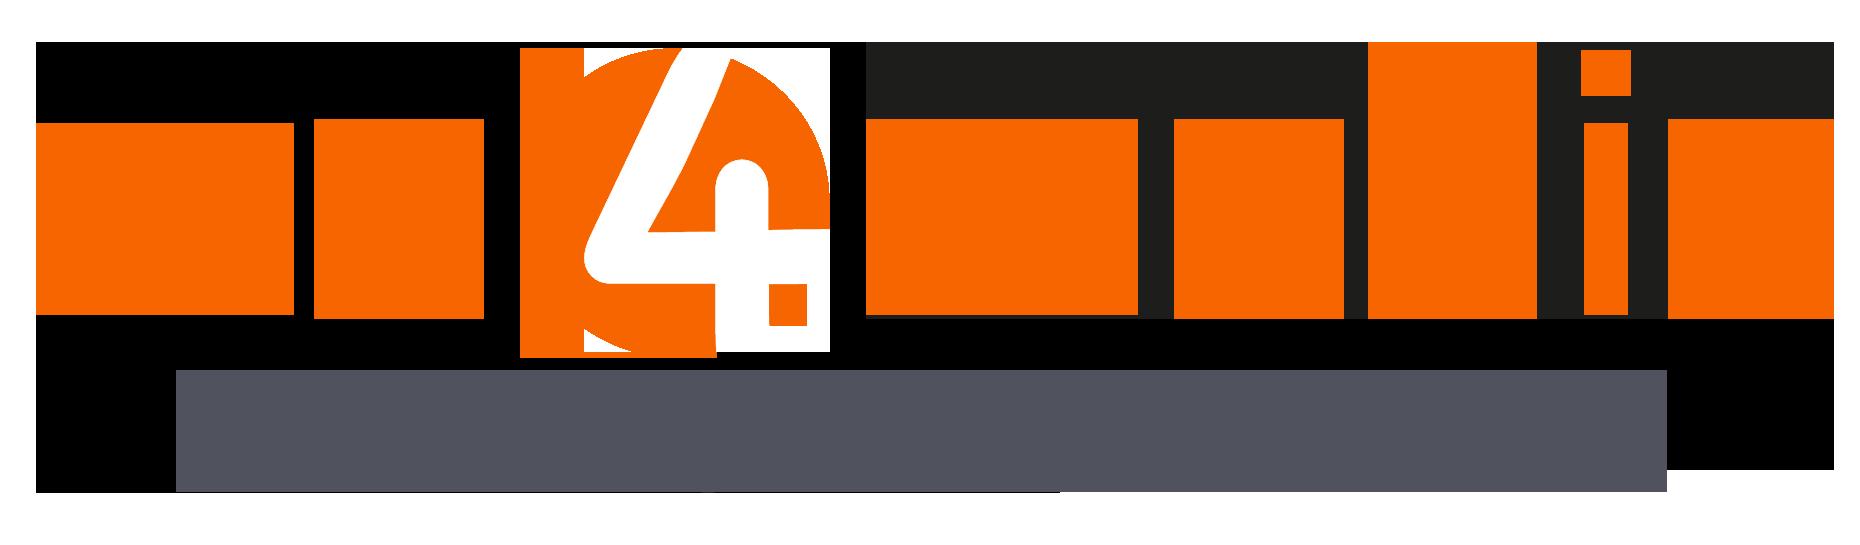 Logo We4Media ORANJEBLAUW